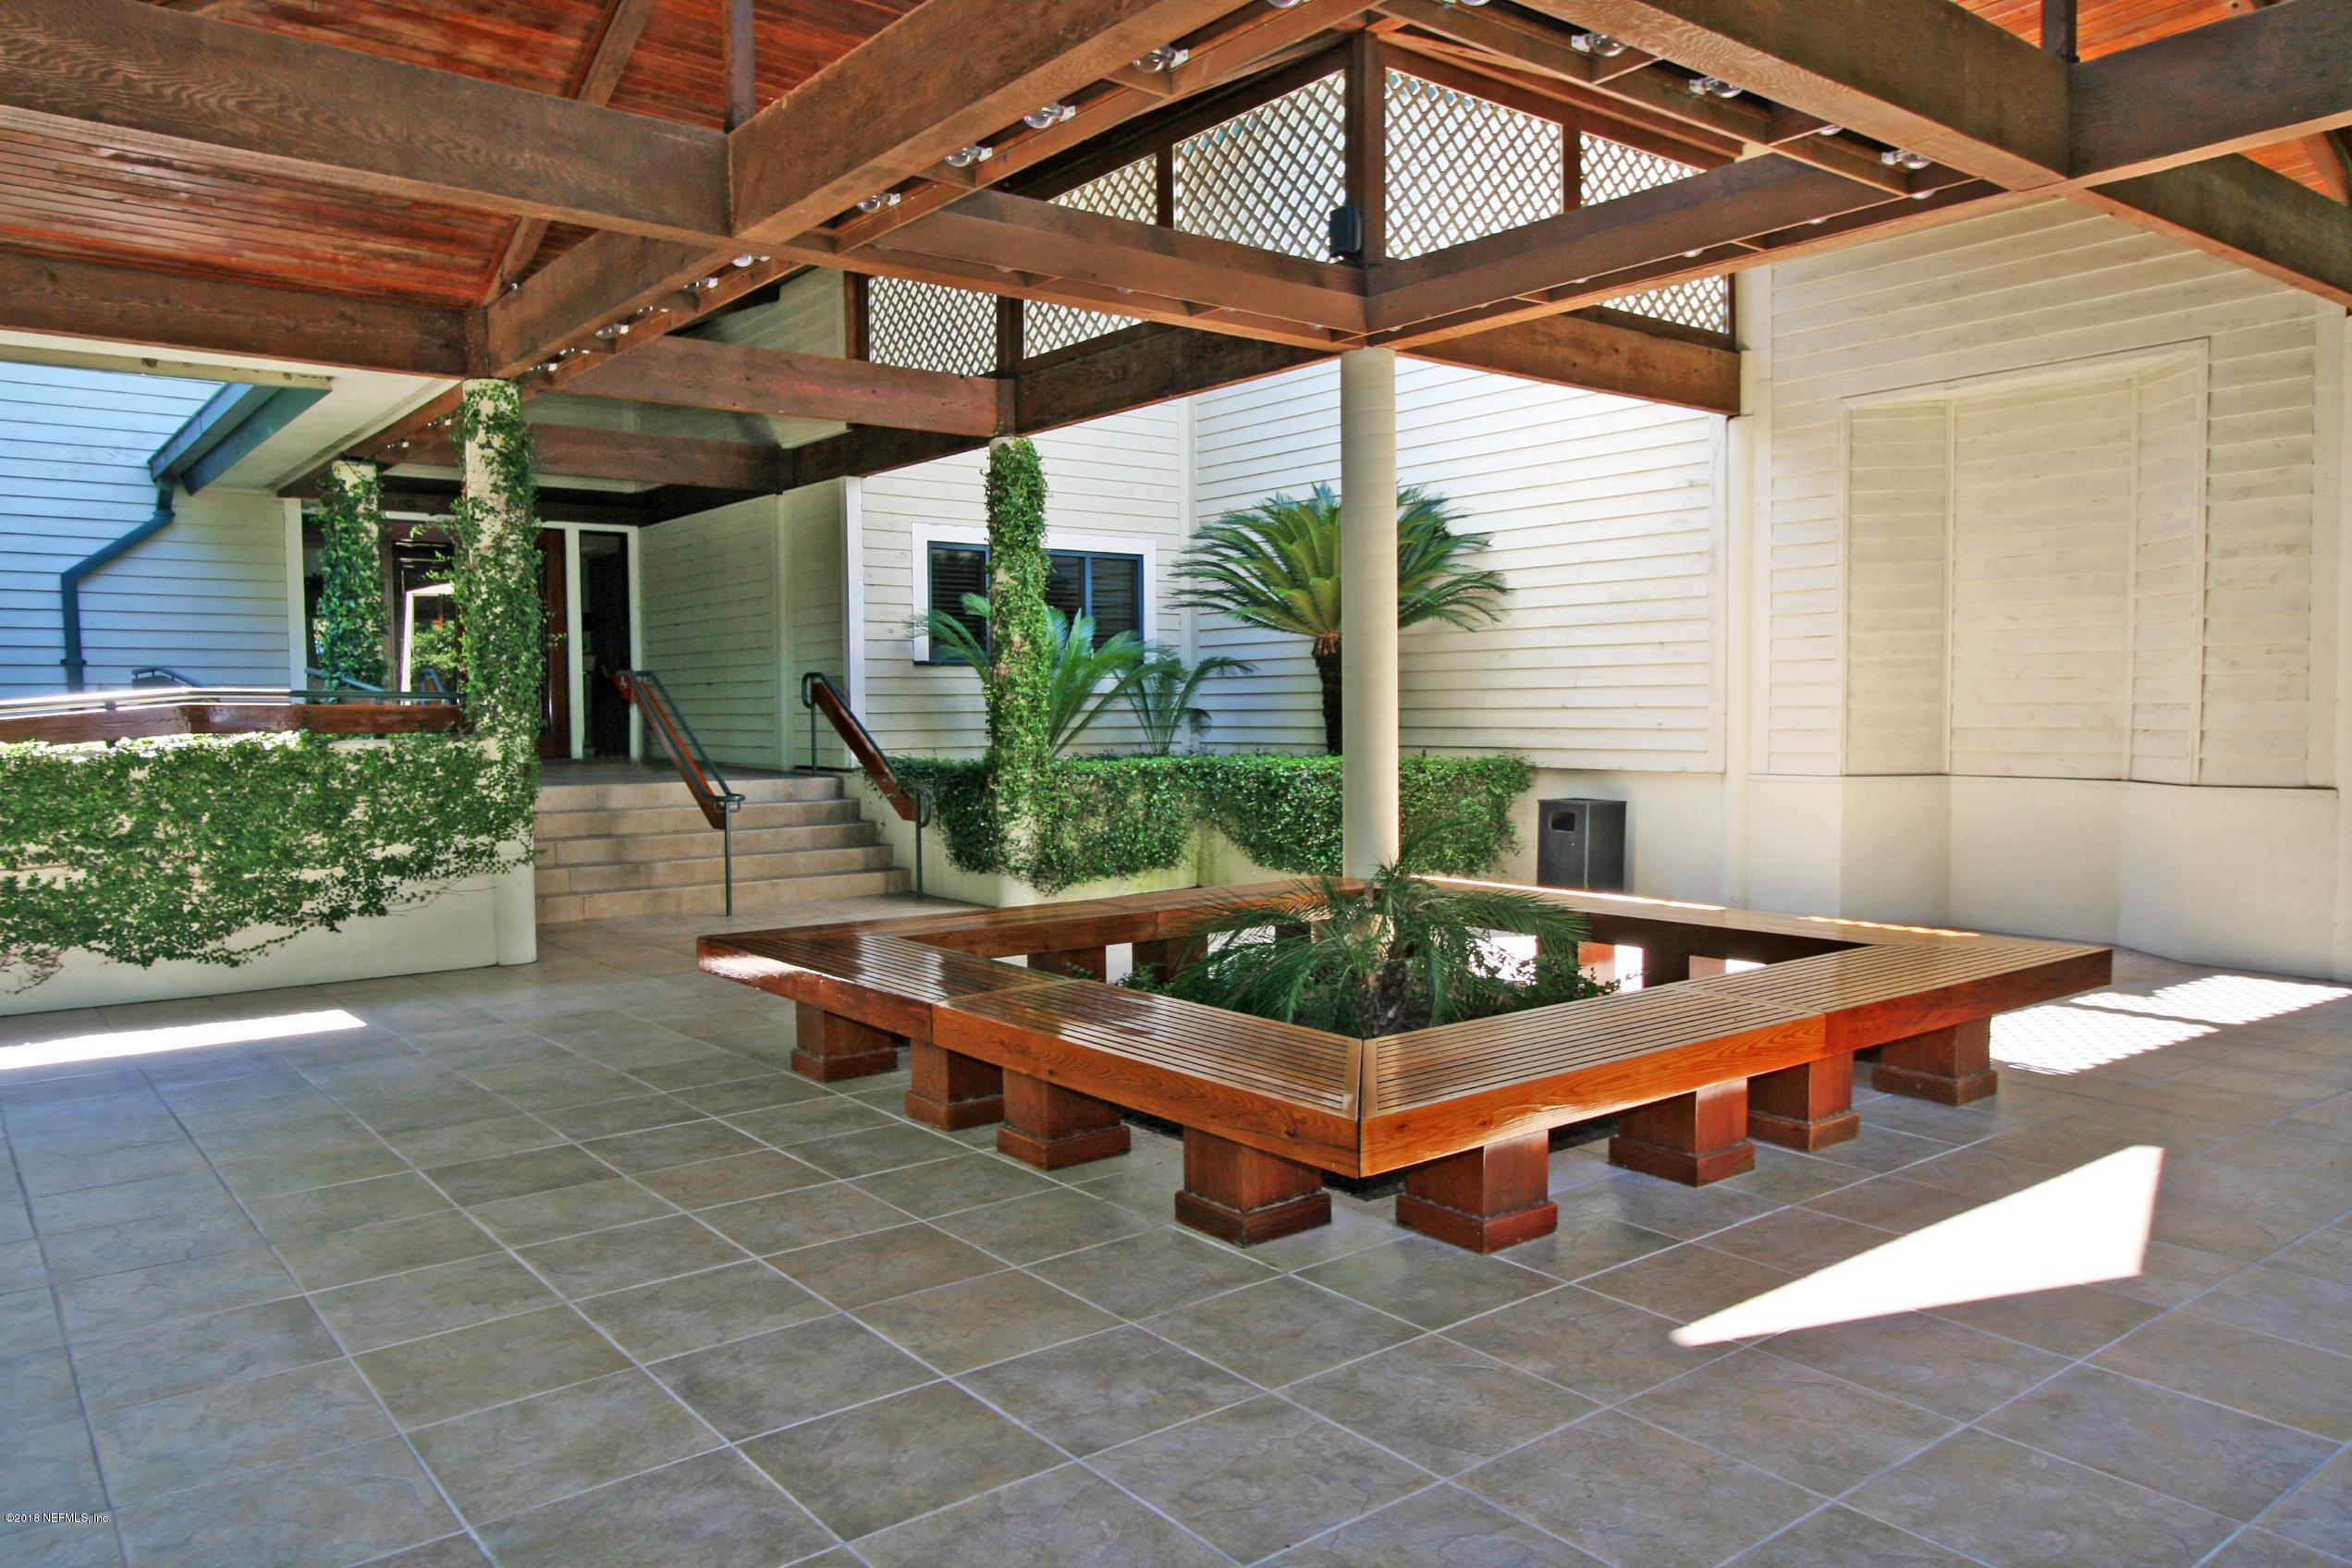 204 GREEN HERON, PONTE VEDRA BEACH, FLORIDA 32082, 5 Bedrooms Bedrooms, ,4 BathroomsBathrooms,Residential - single family,For sale,GREEN HERON,955358